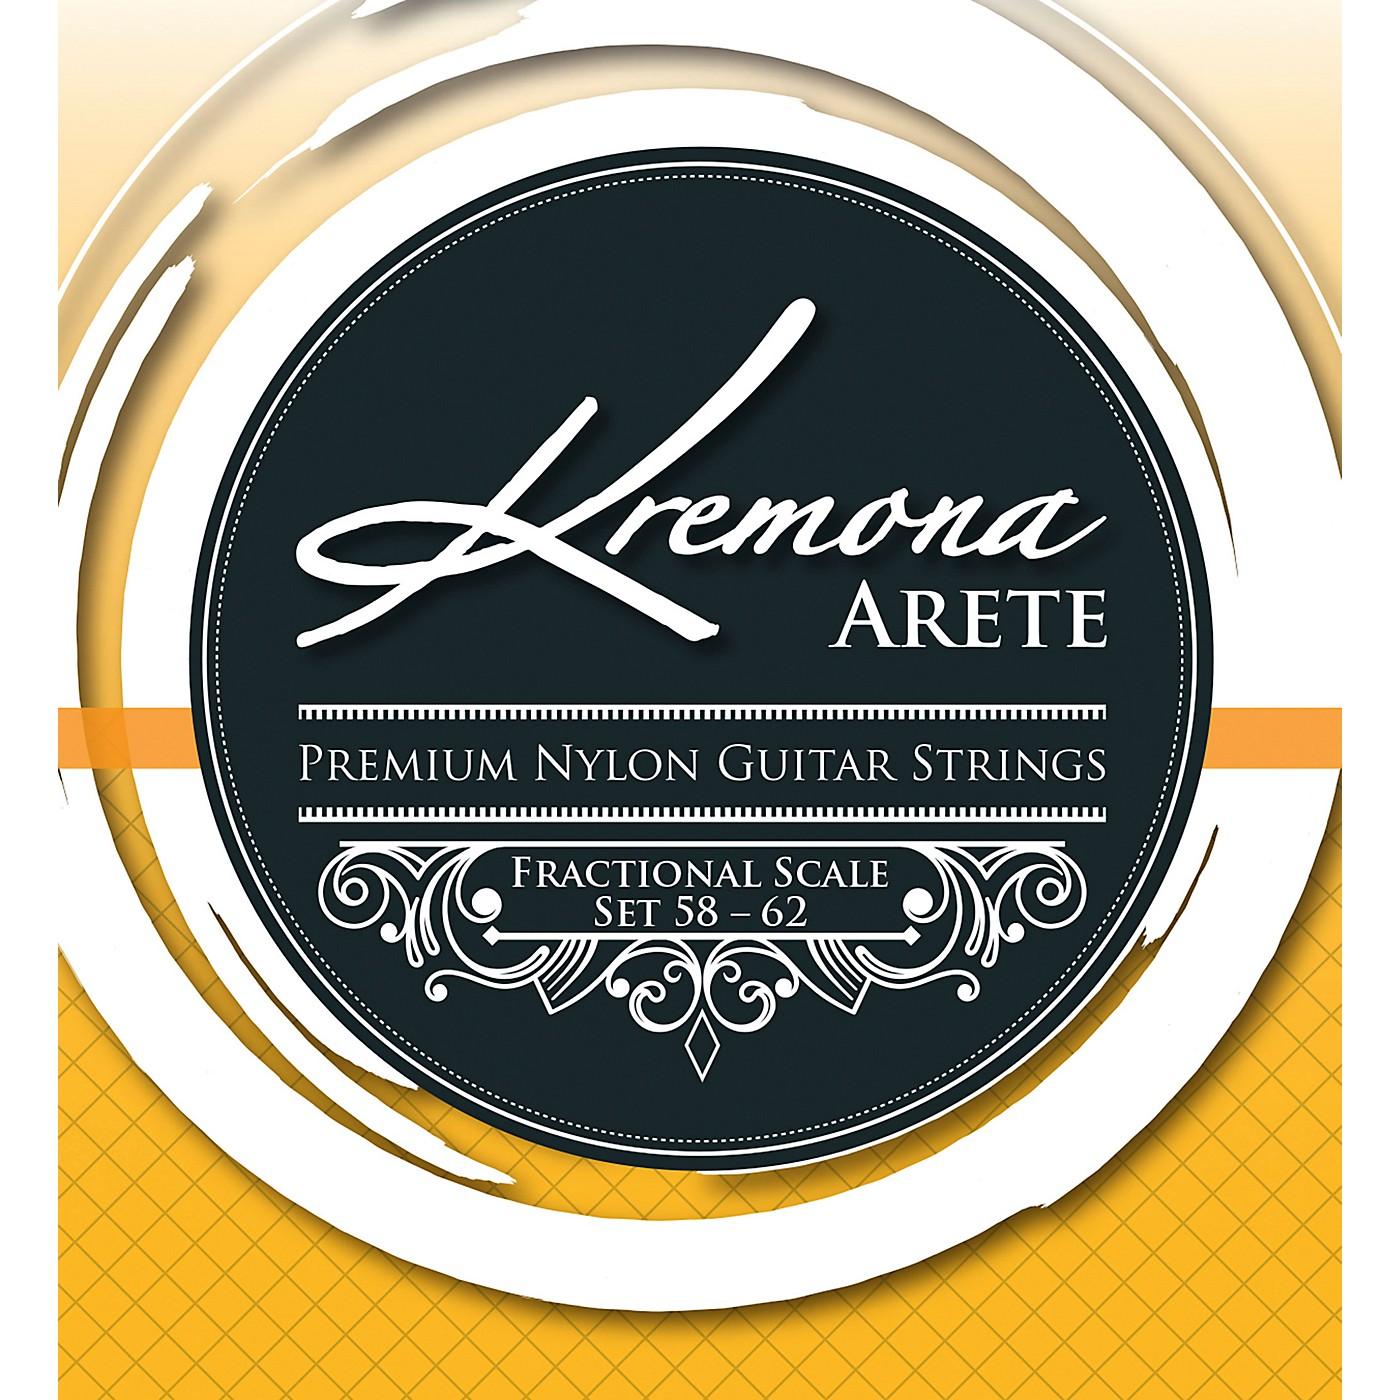 Kremona Arete Premium Nylon Guitar Strings Fractional Scale Set 58-62 thumbnail